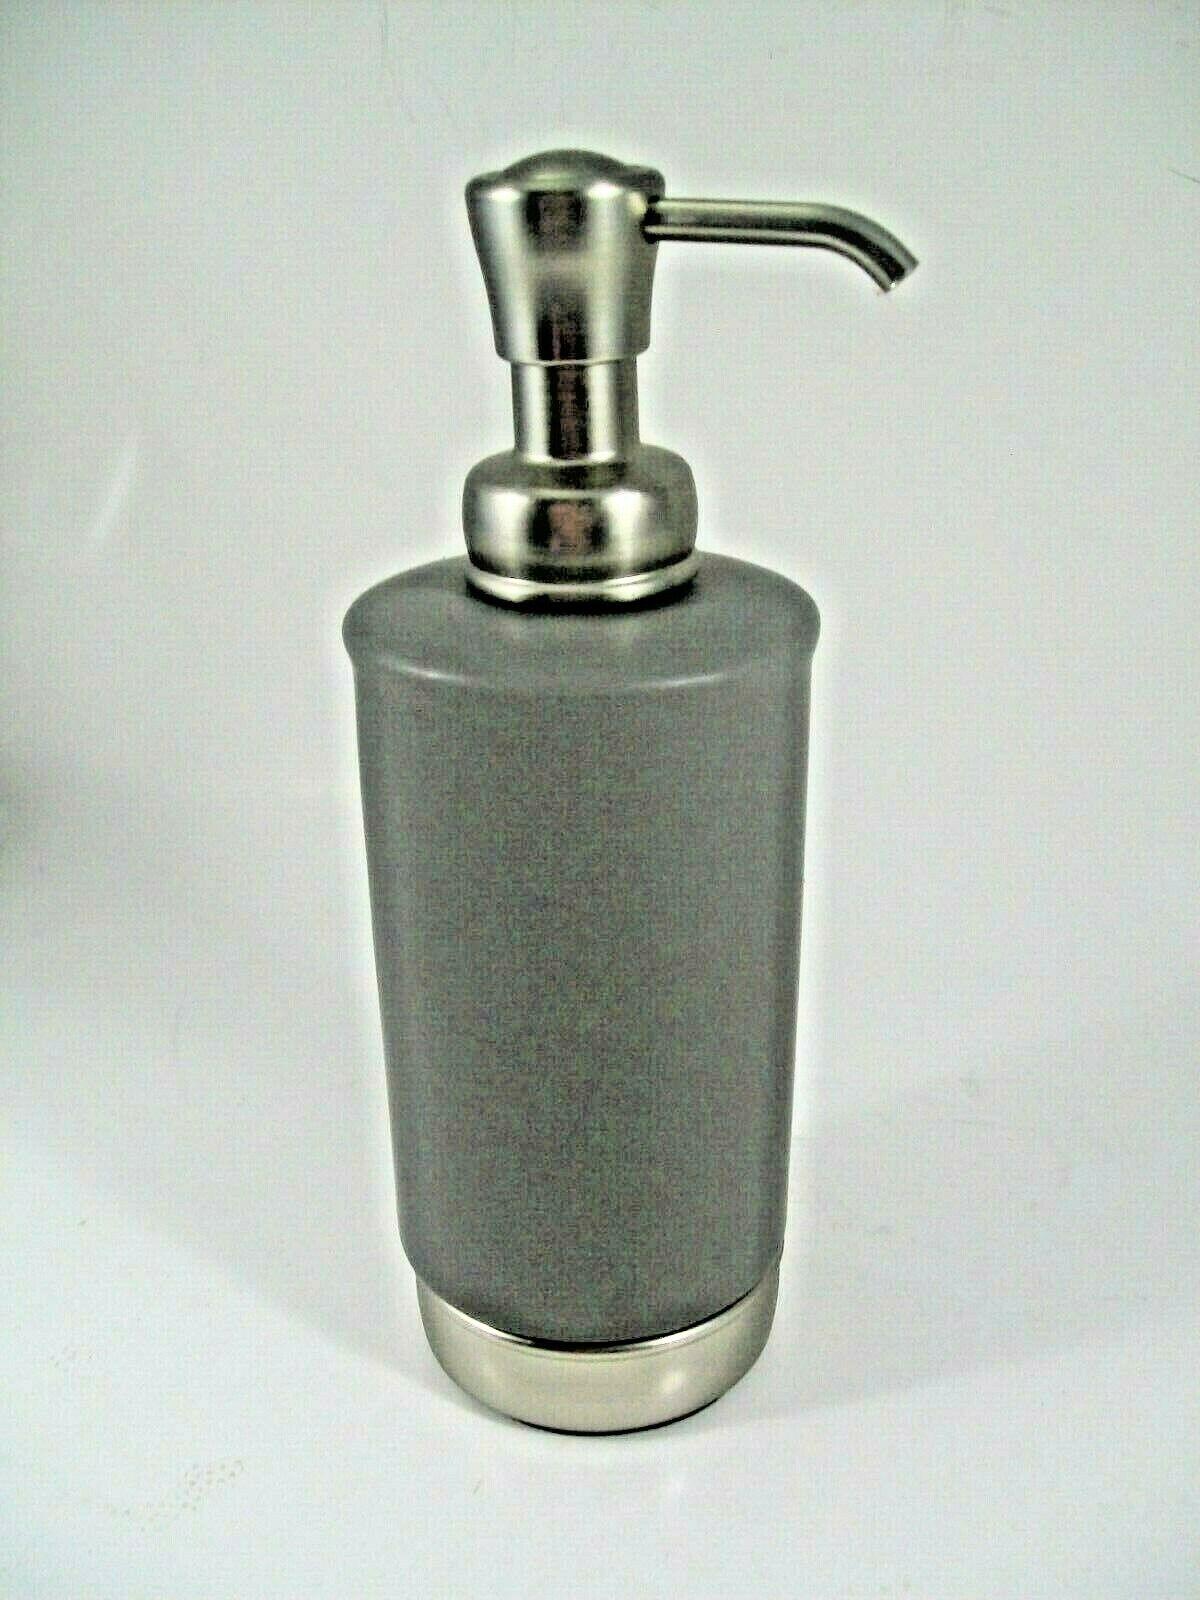 Soap Dispenser York Soap Pump in Matte Grey